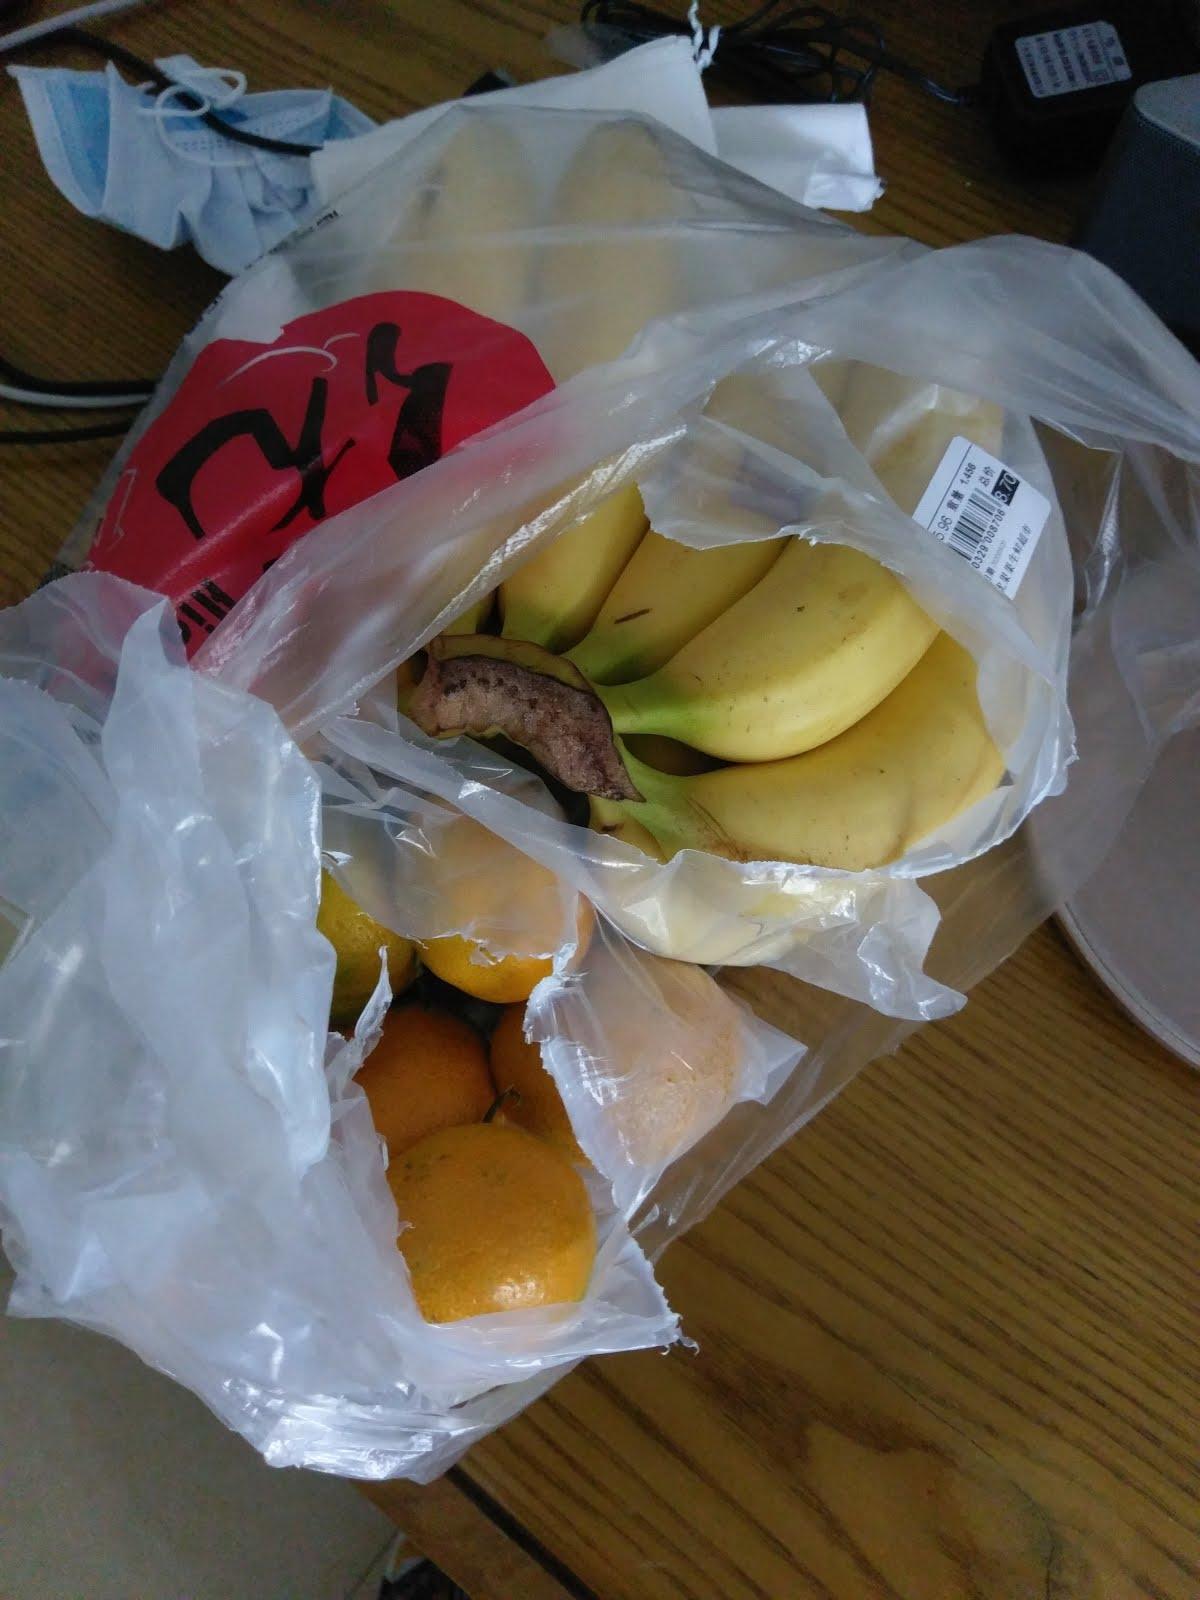 my treat of fruits